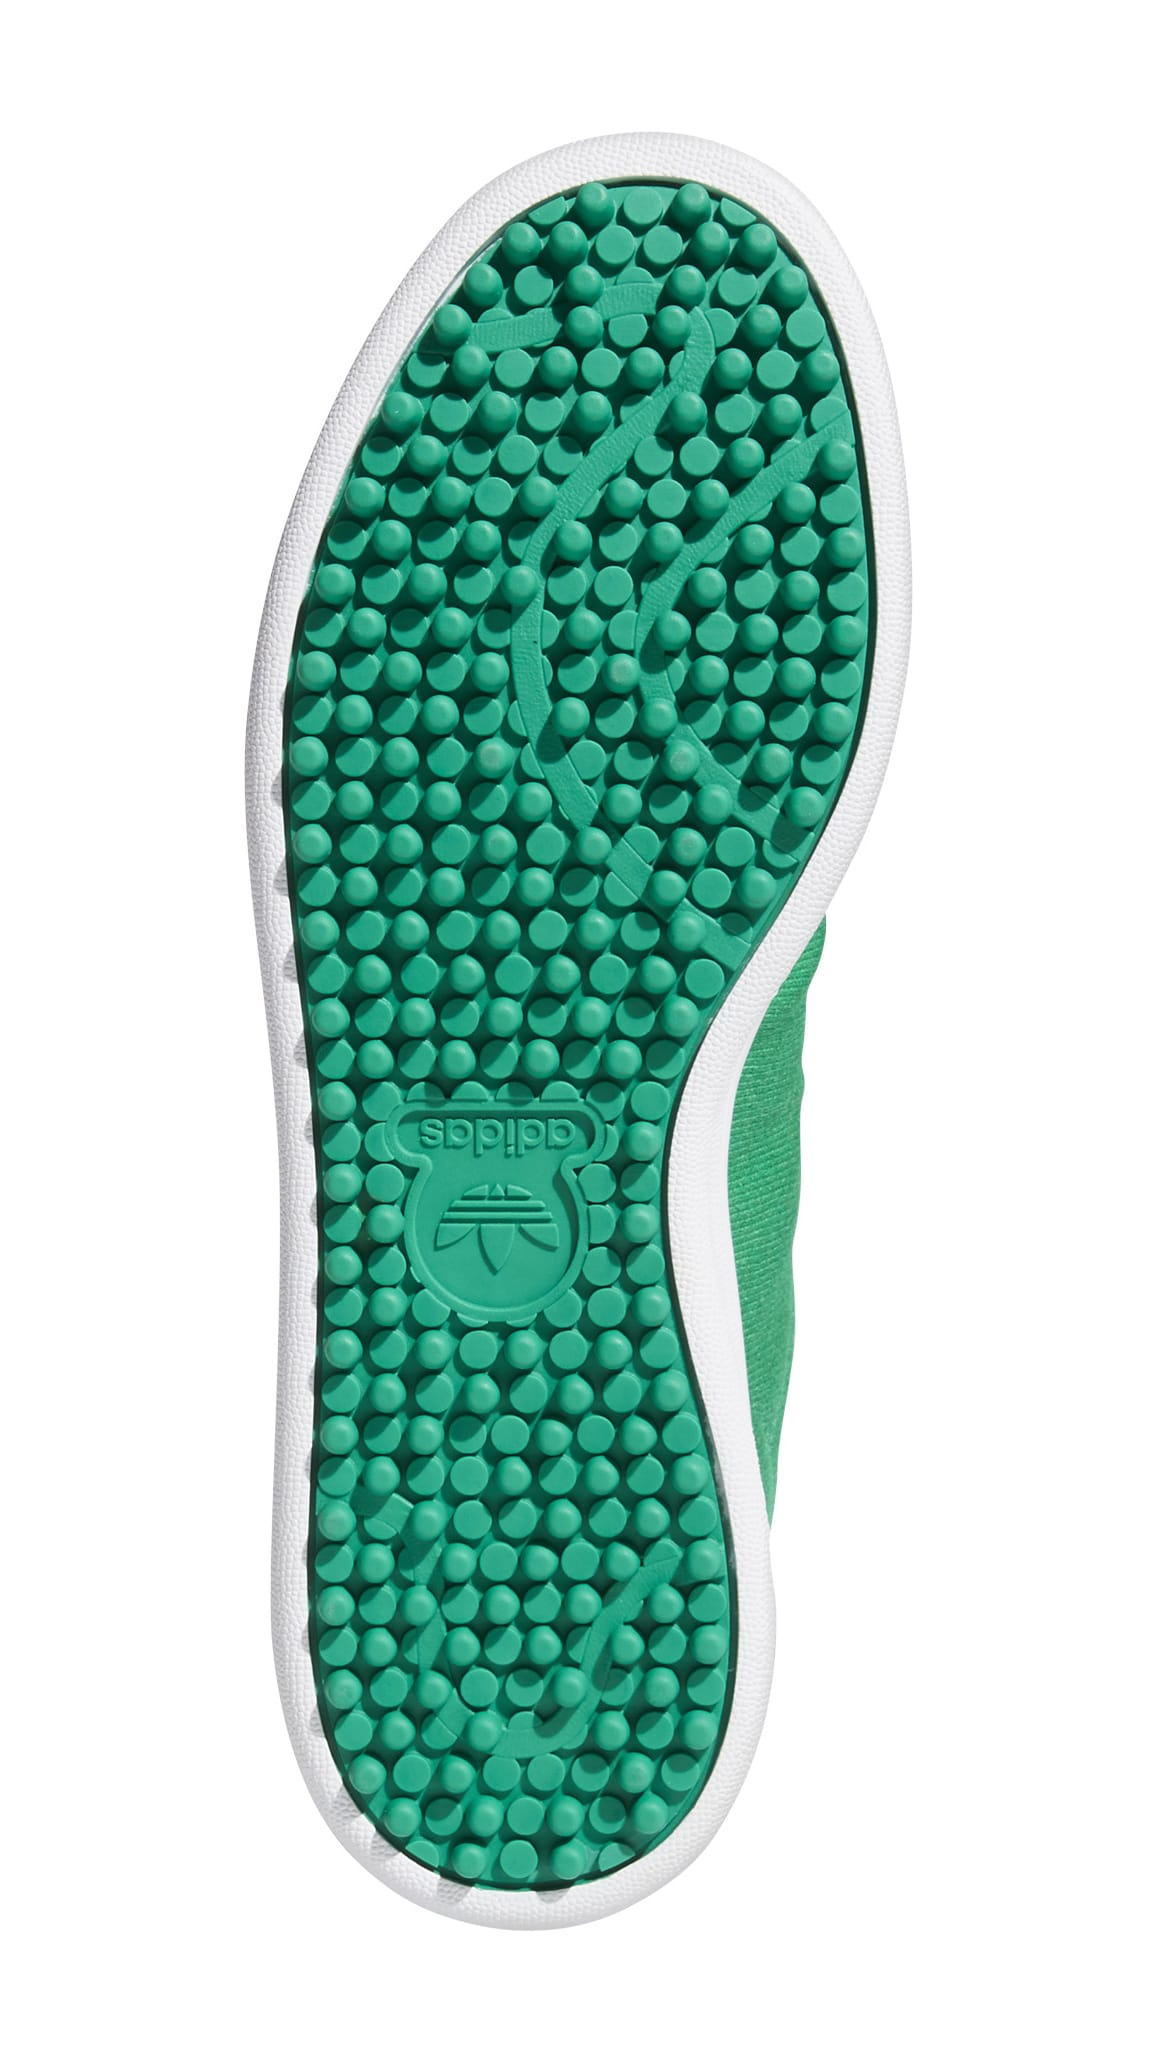 Adidas Stan Smith Golf Outsole